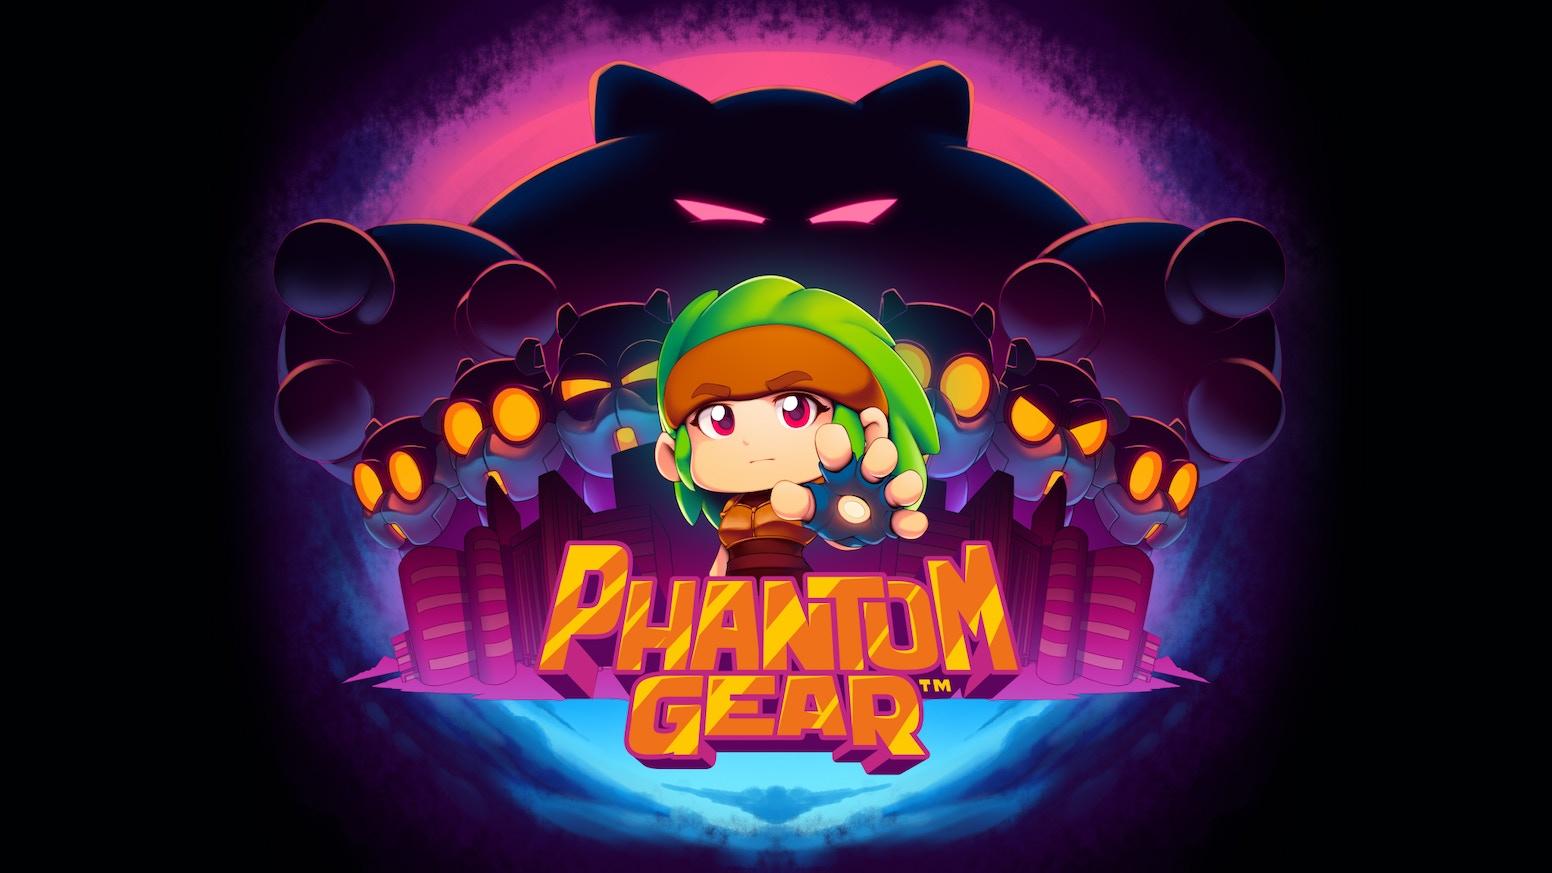 Phantom Gear for the Sega Genesis / Mega Drive by Mega Cat